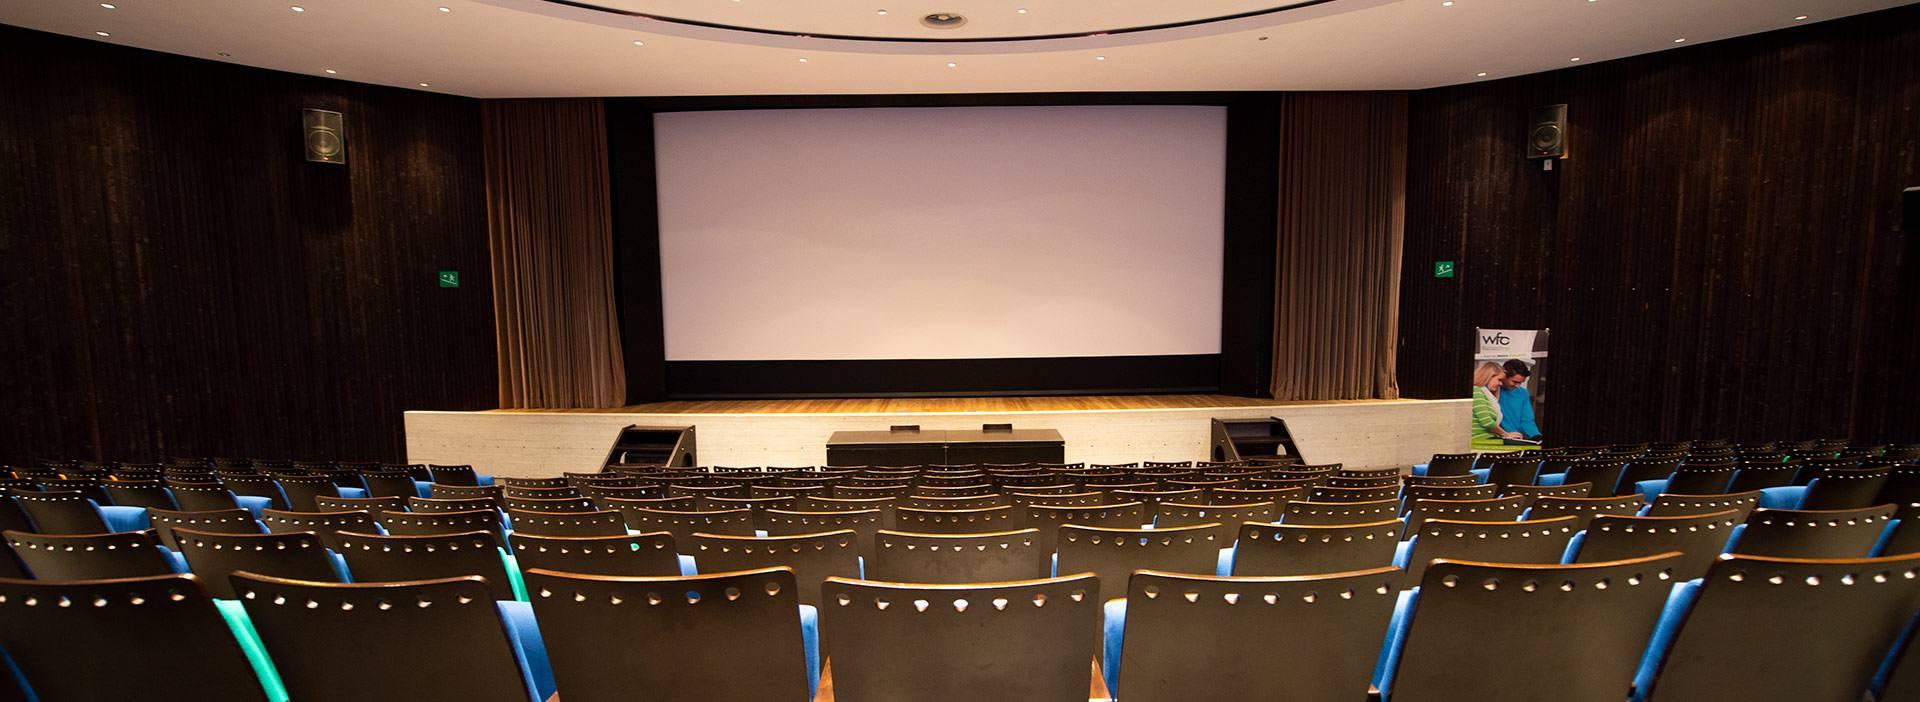 Filmclub – Aristonkino Meran